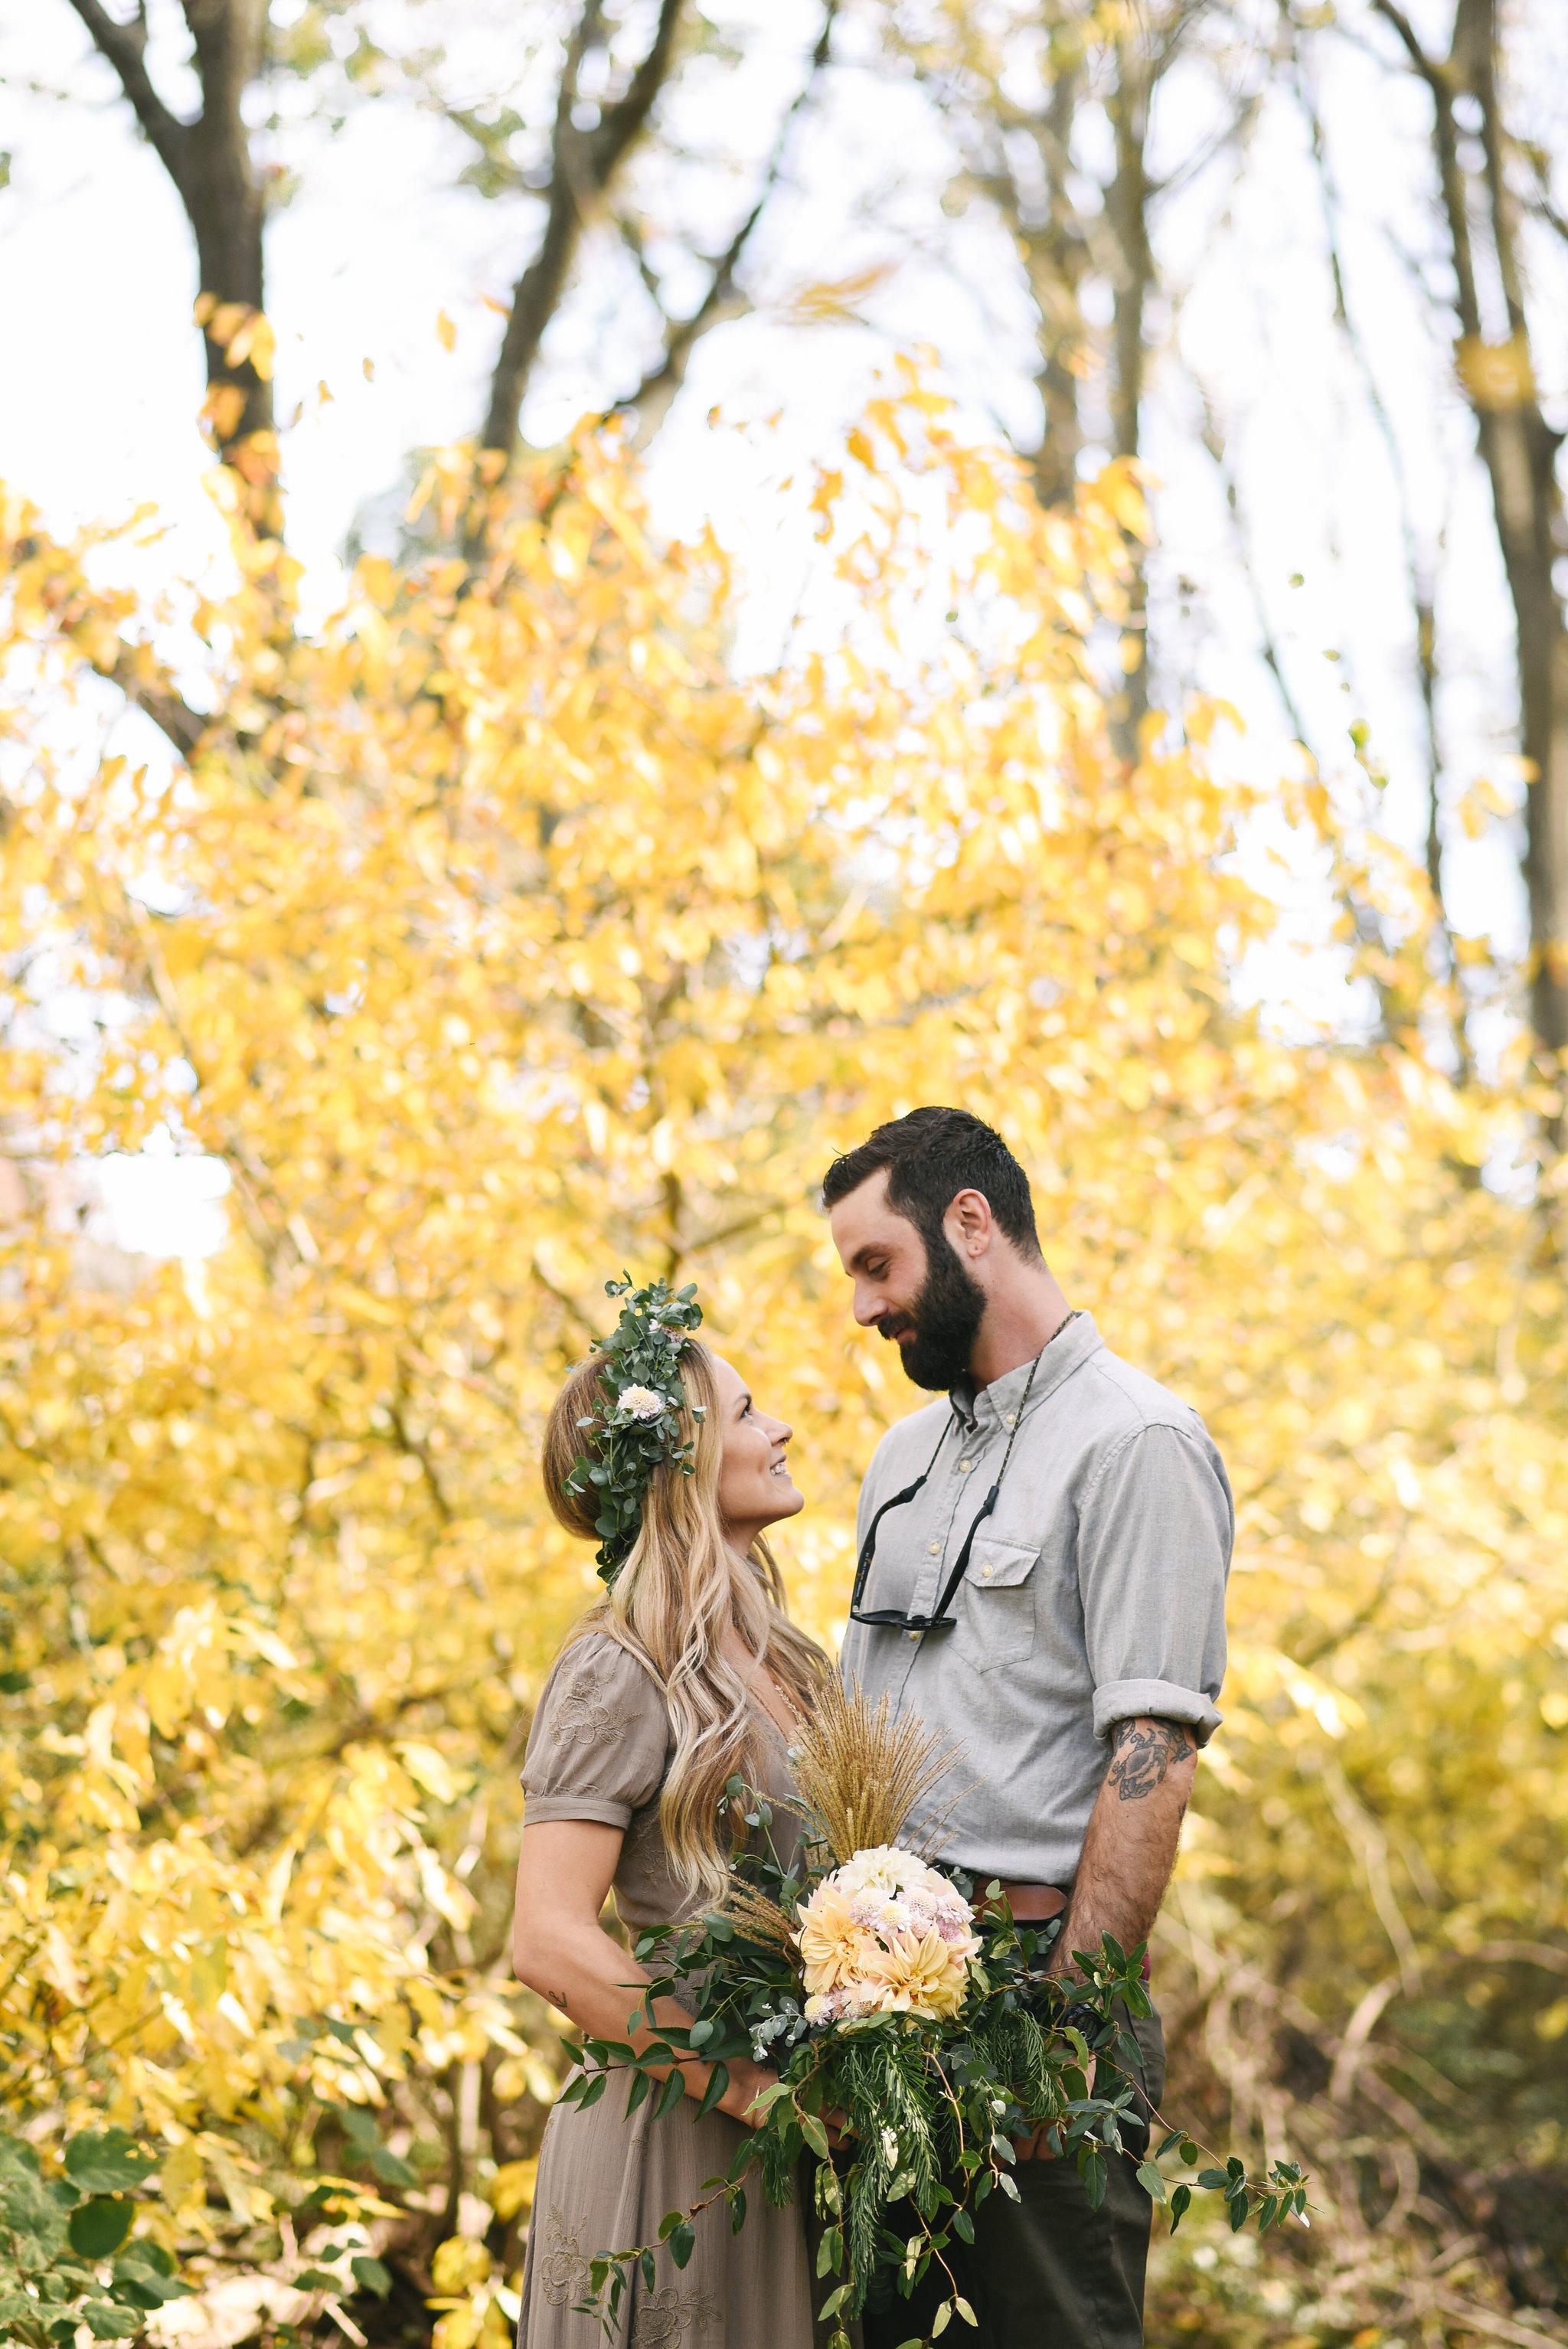 Baltimore, Maryland Wedding Photographer, Backyard Wedding, DIY, Rustic, Casual, Fall Wedding, Woodland, Flower Crown, Brightside Boutique Dress